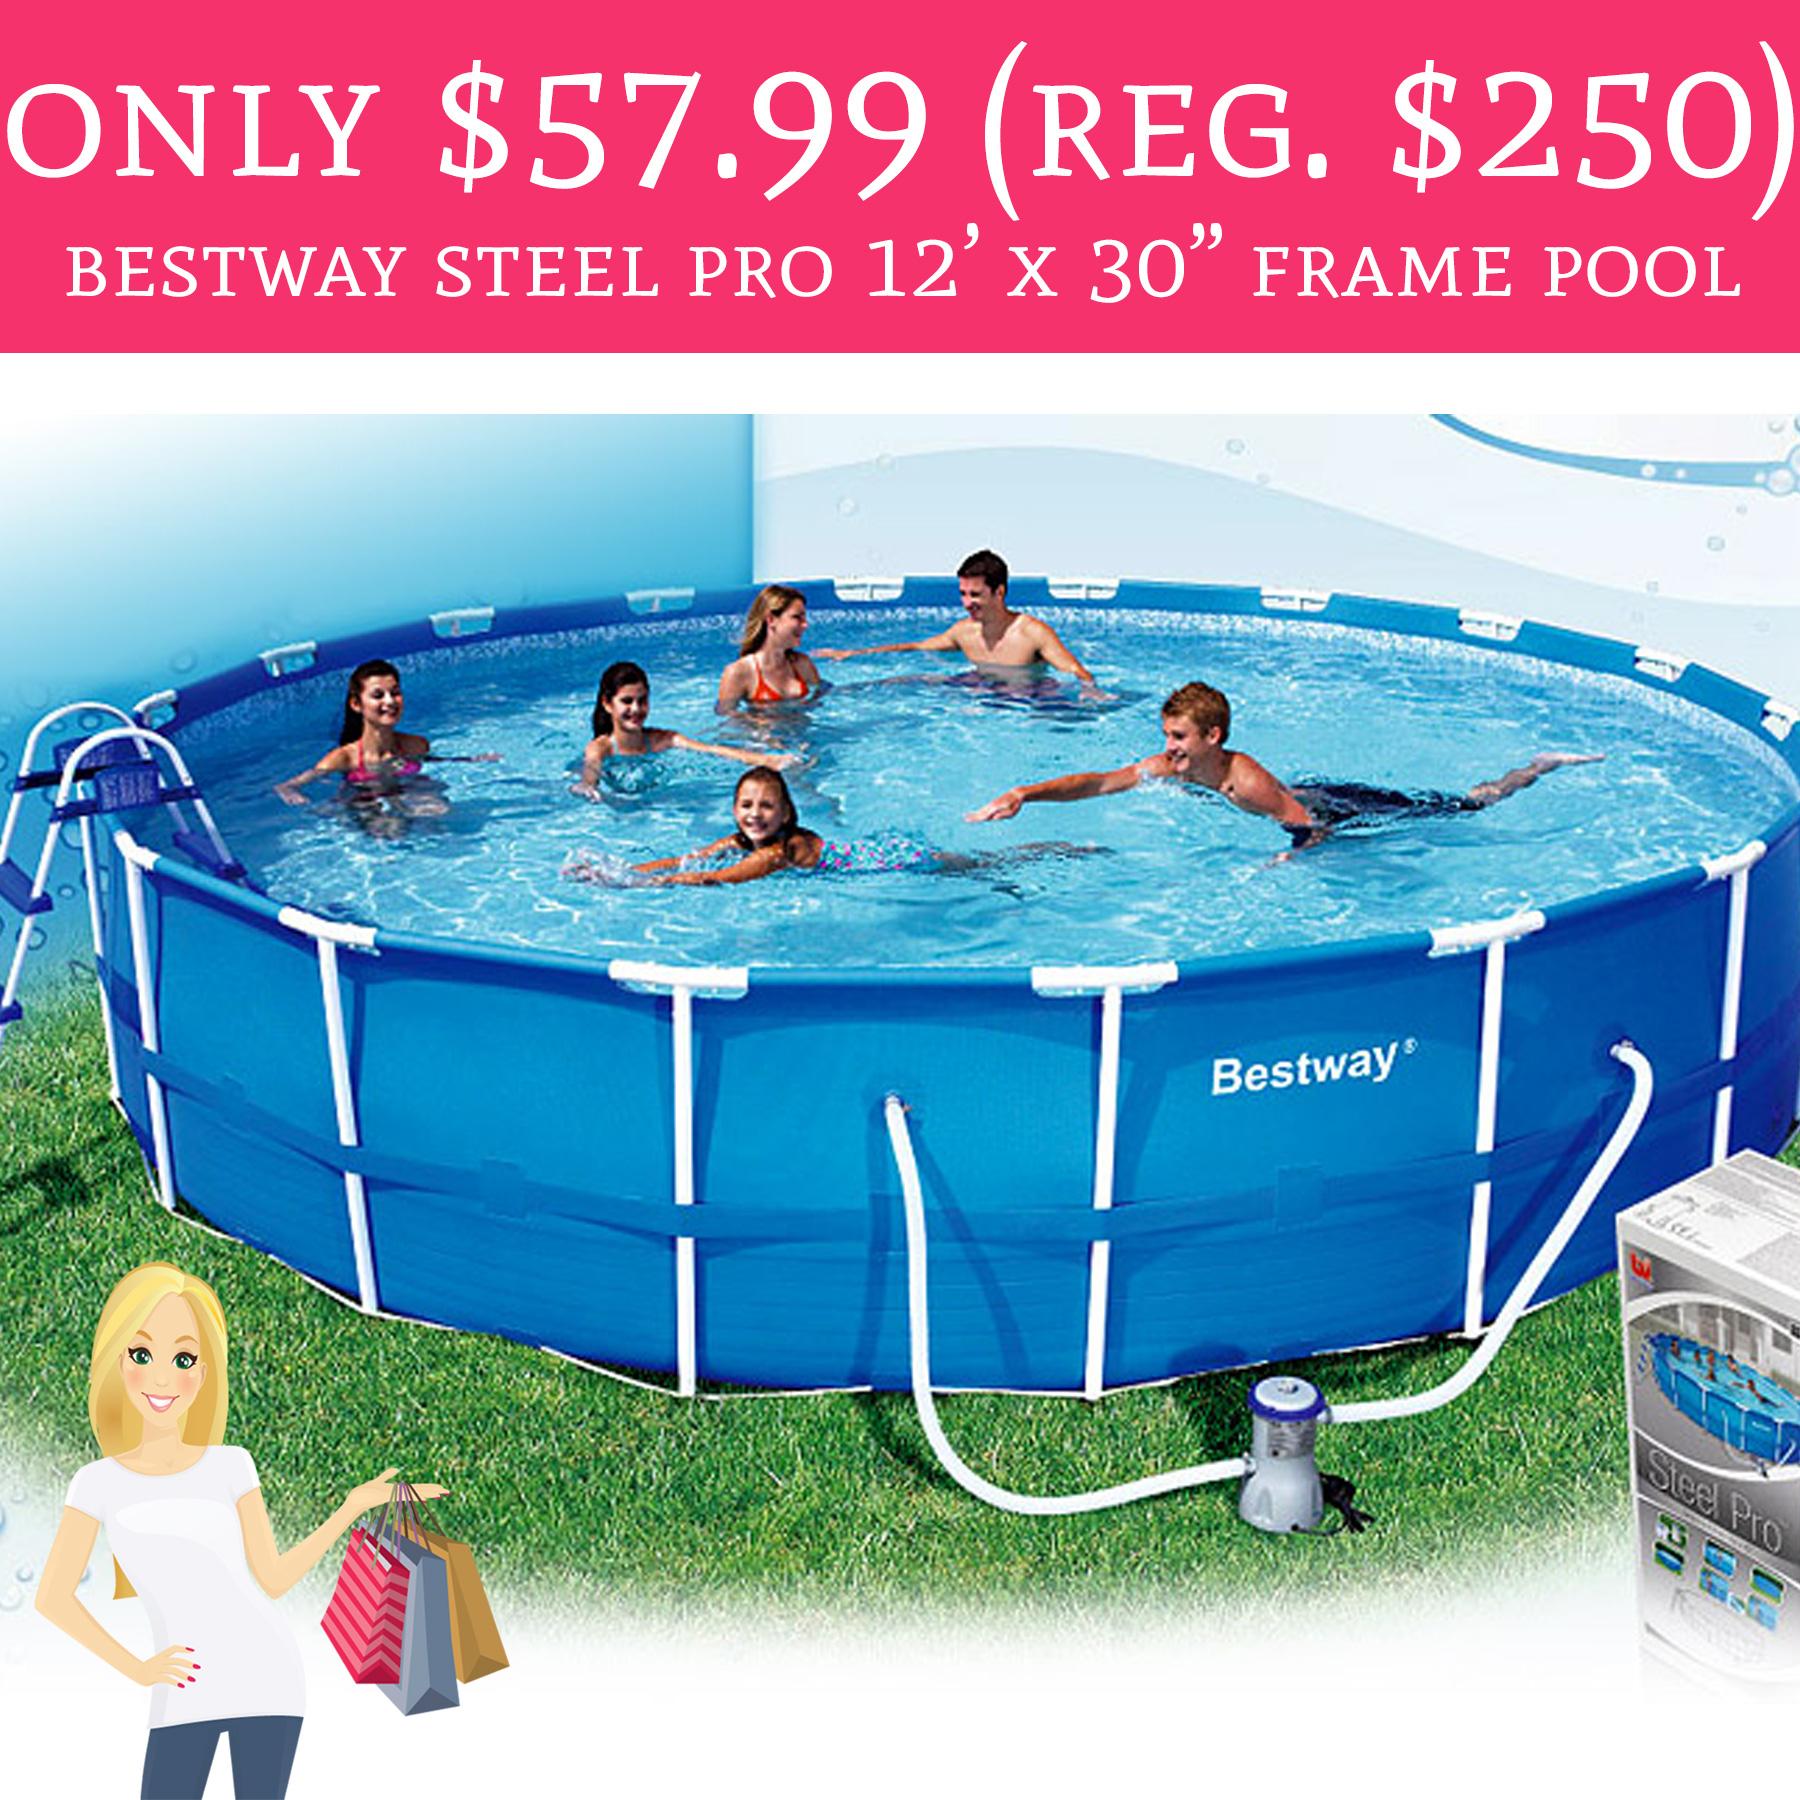 WHOA! Only $57.99 (Regular $250) Bestway Steel Pro 12\' x 30\